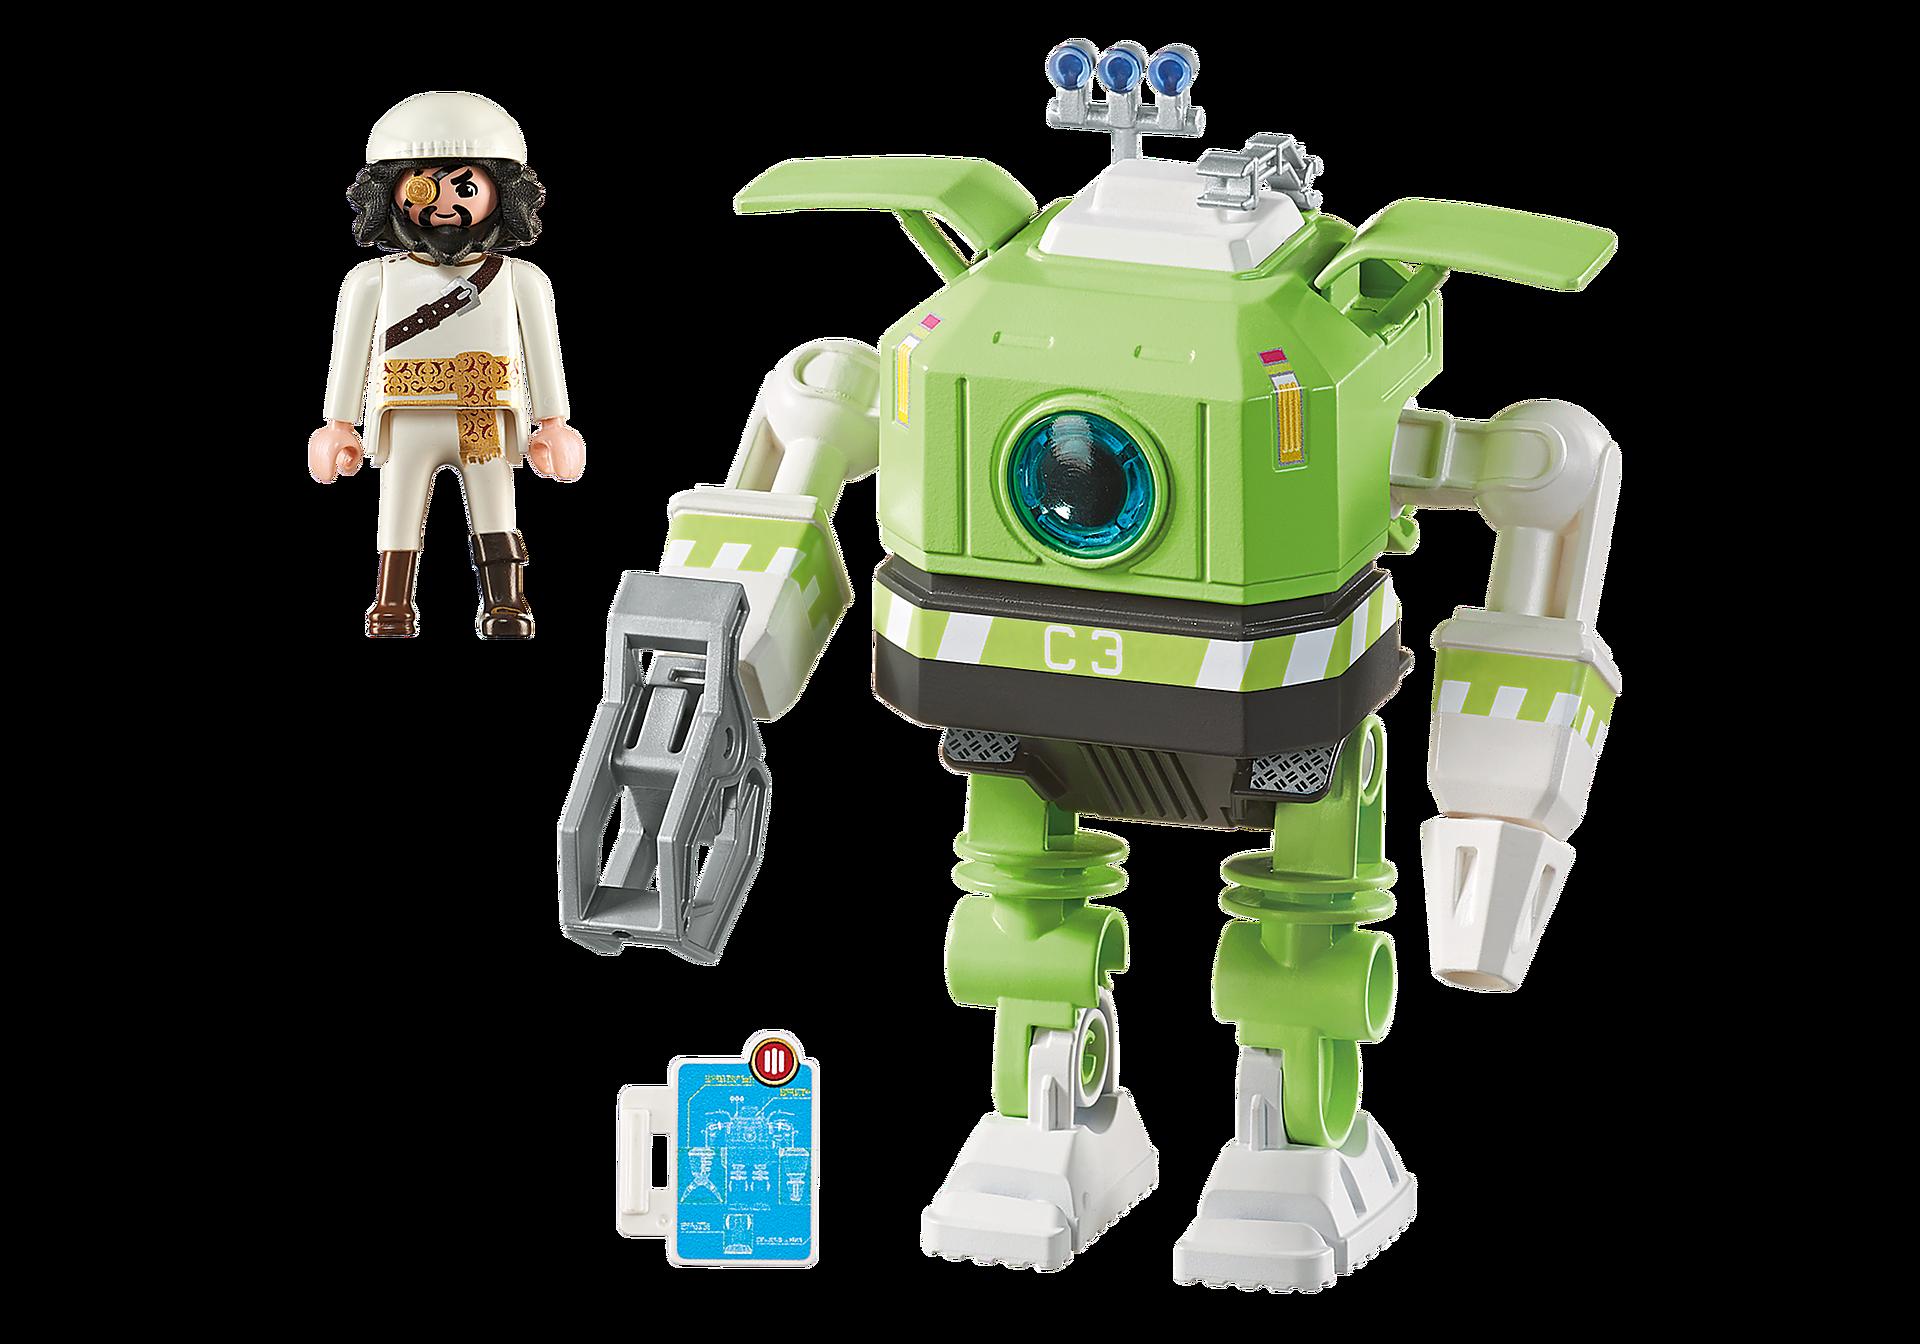 http://media.playmobil.com/i/playmobil/6693_product_box_back/Cleano Robot